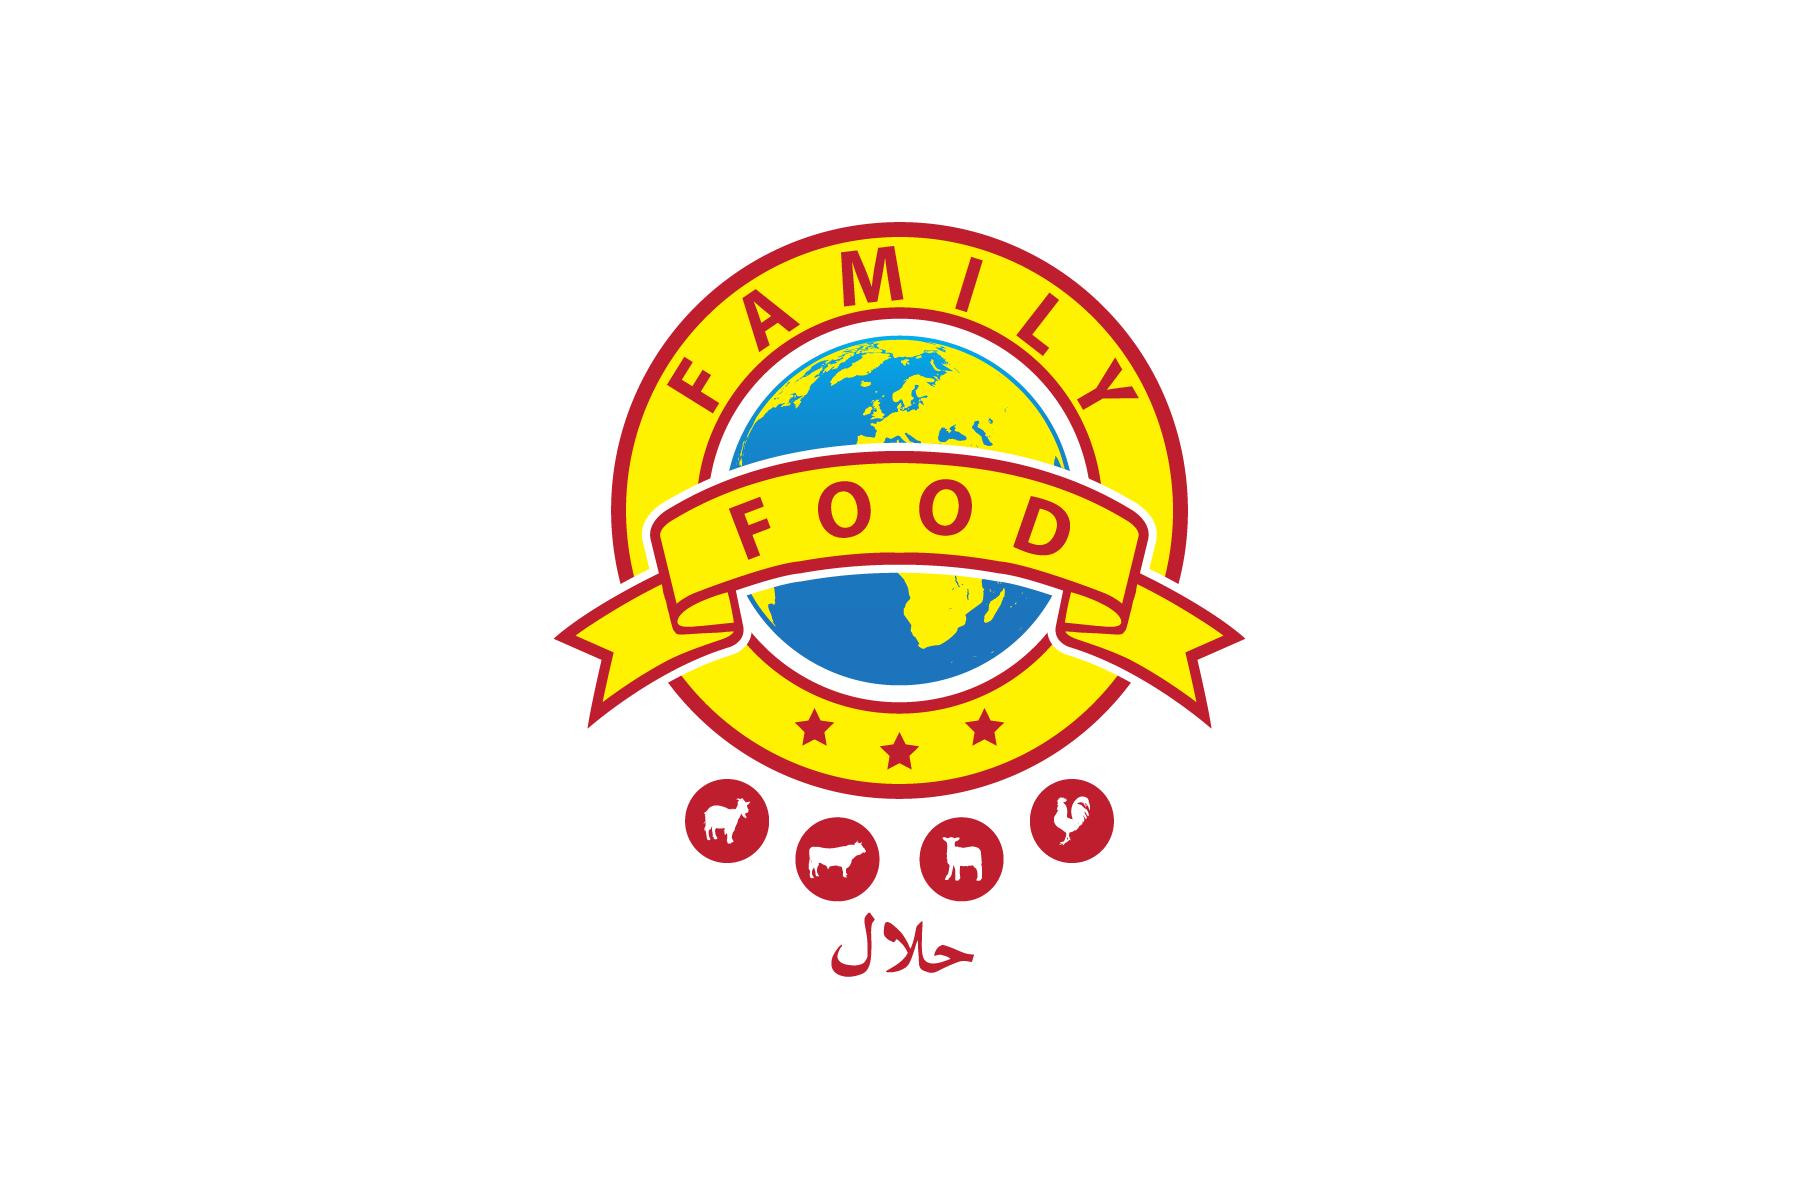 Family Food needs a new logo